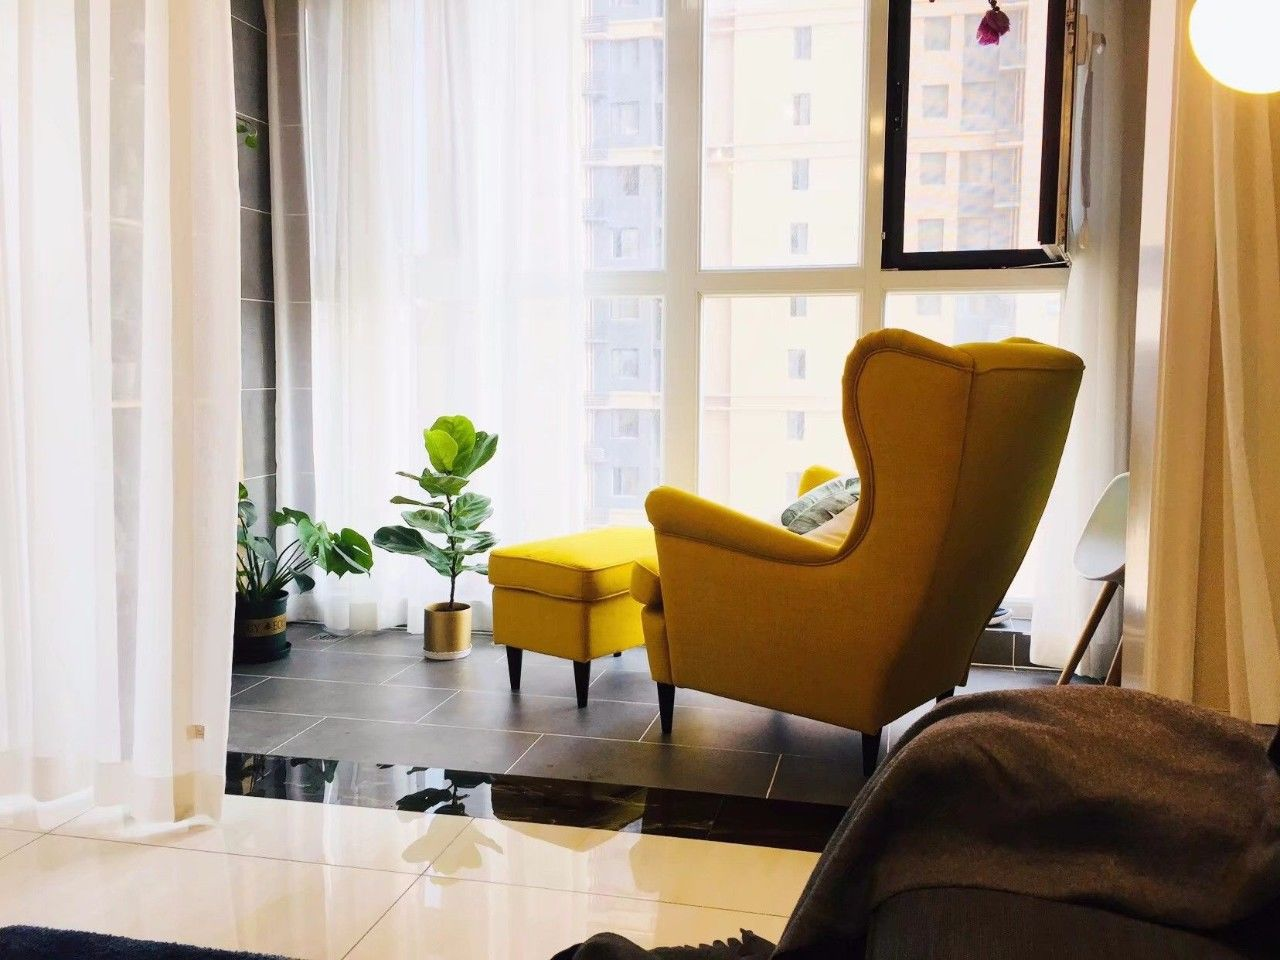 v情趣情趣,这样布置照片,舒适有阳台!连体装椅子情趣内衣图片